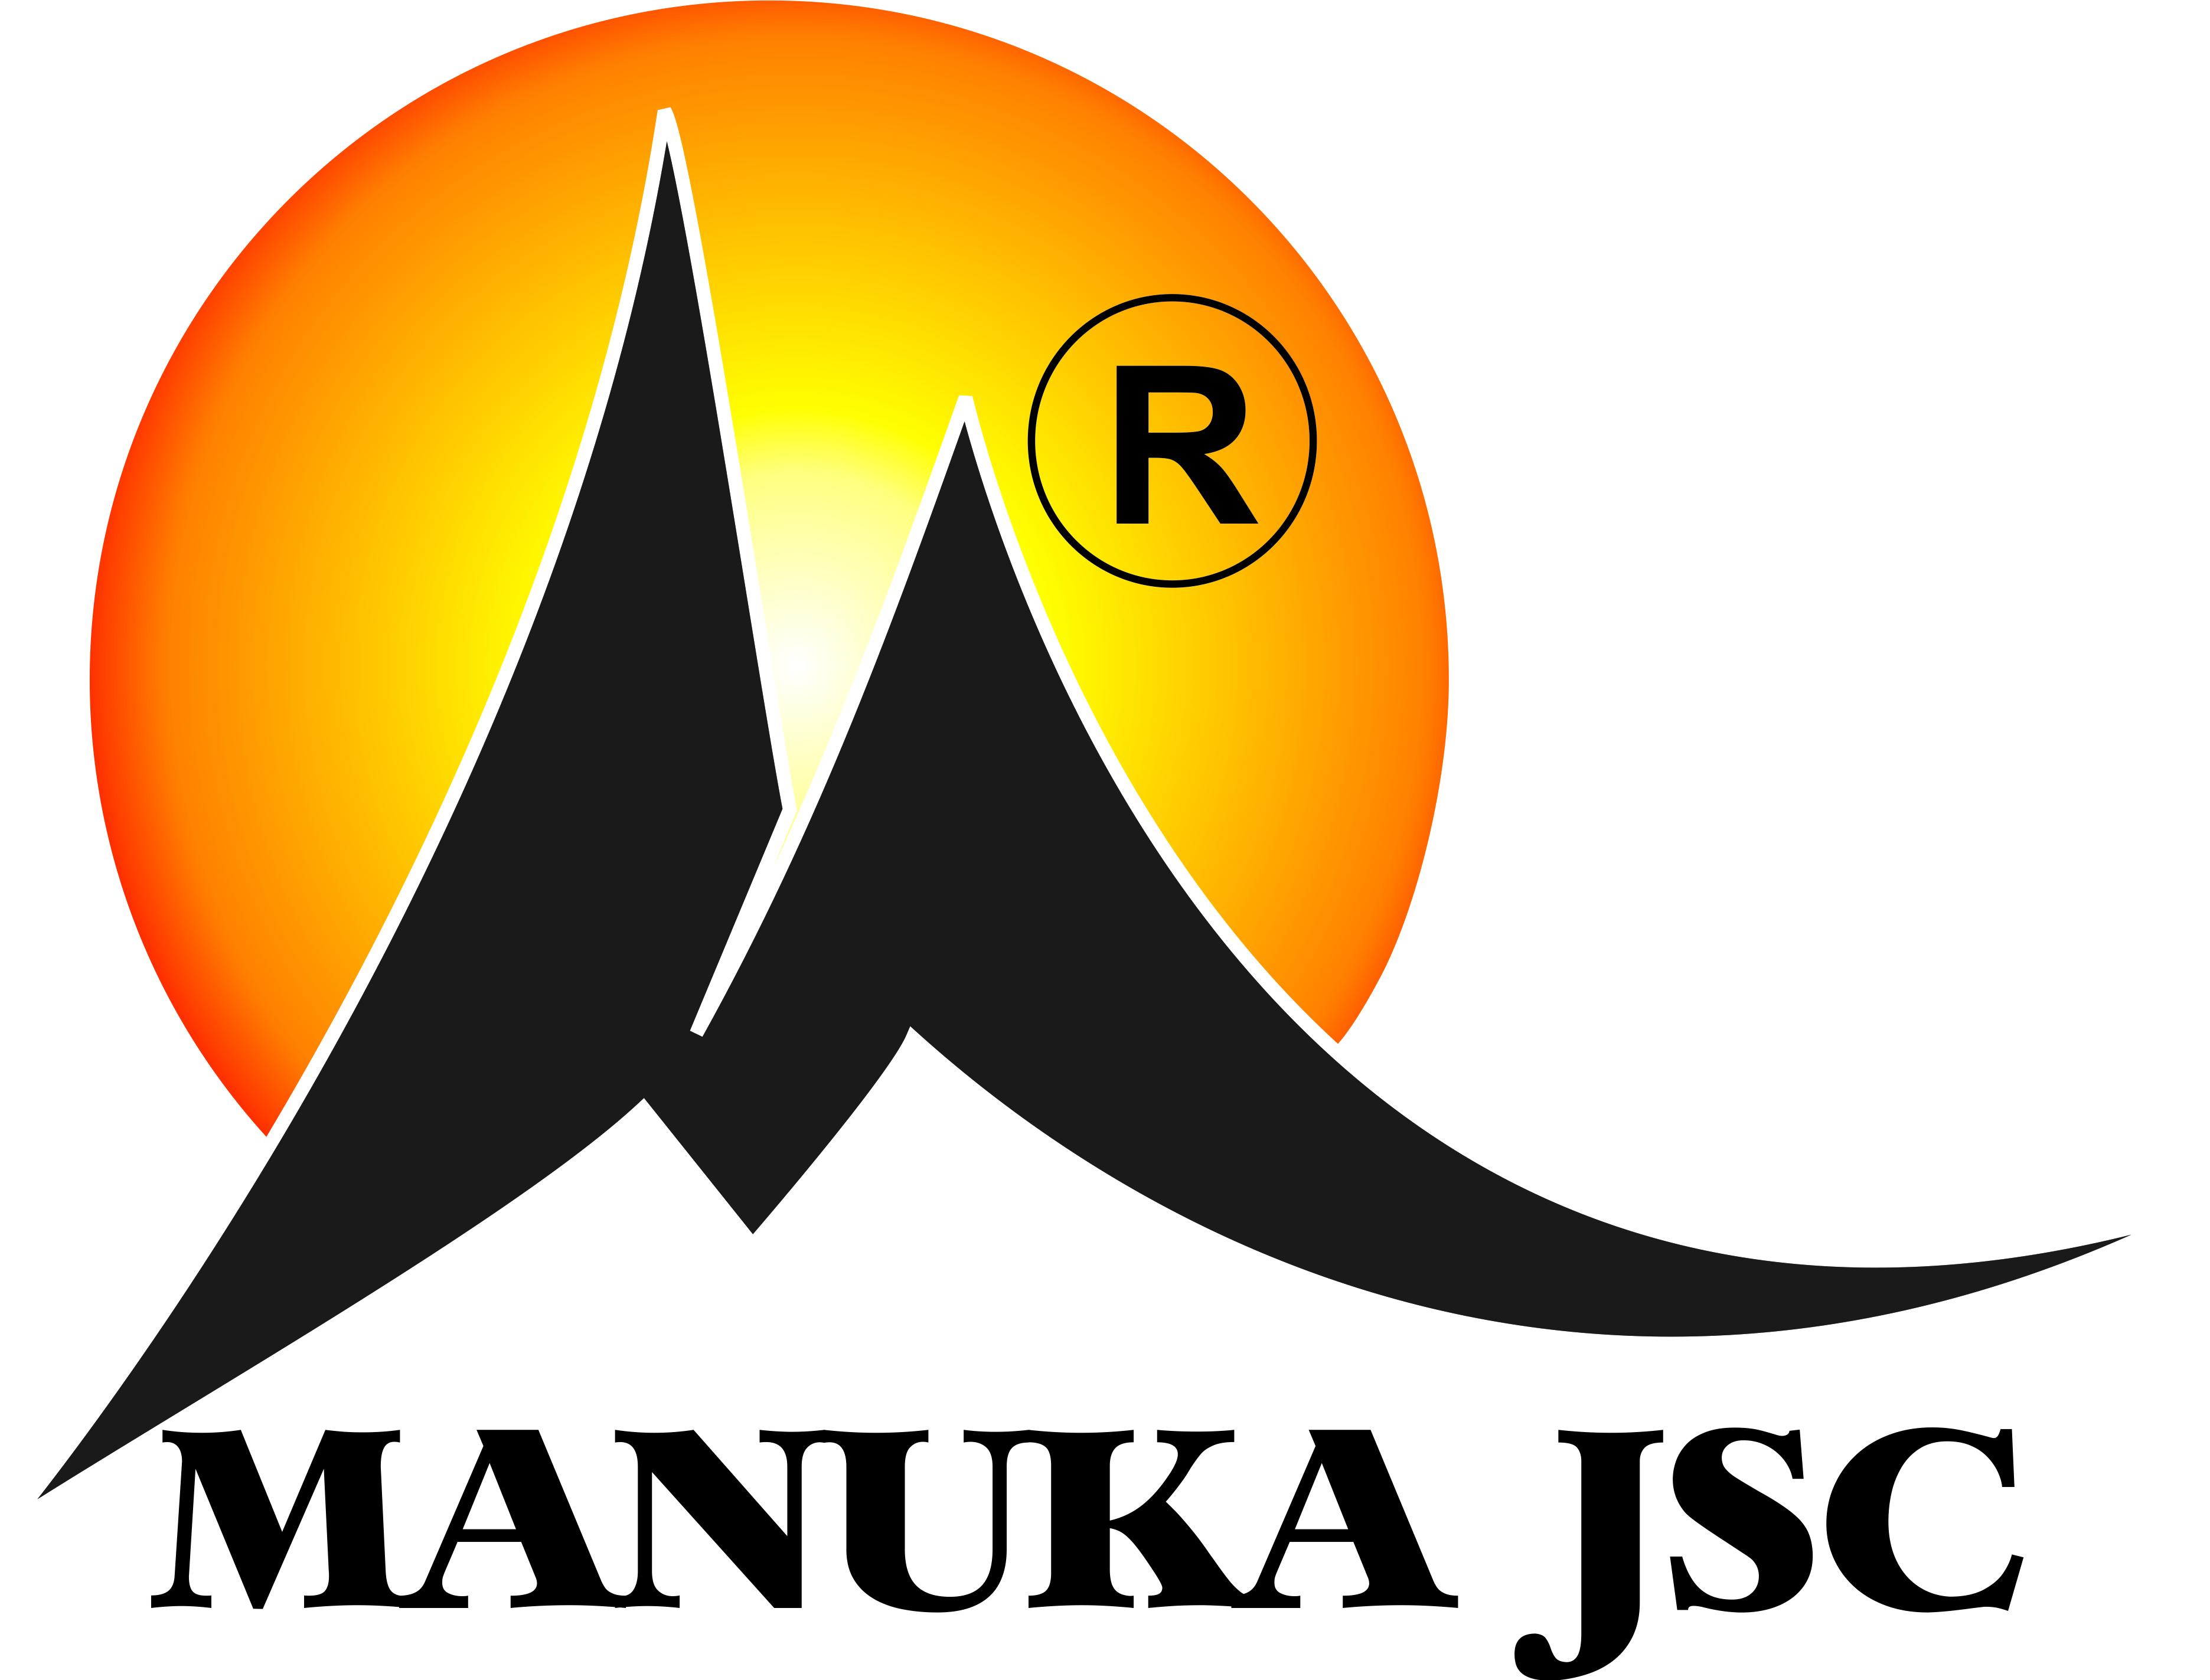 Manuka JSC